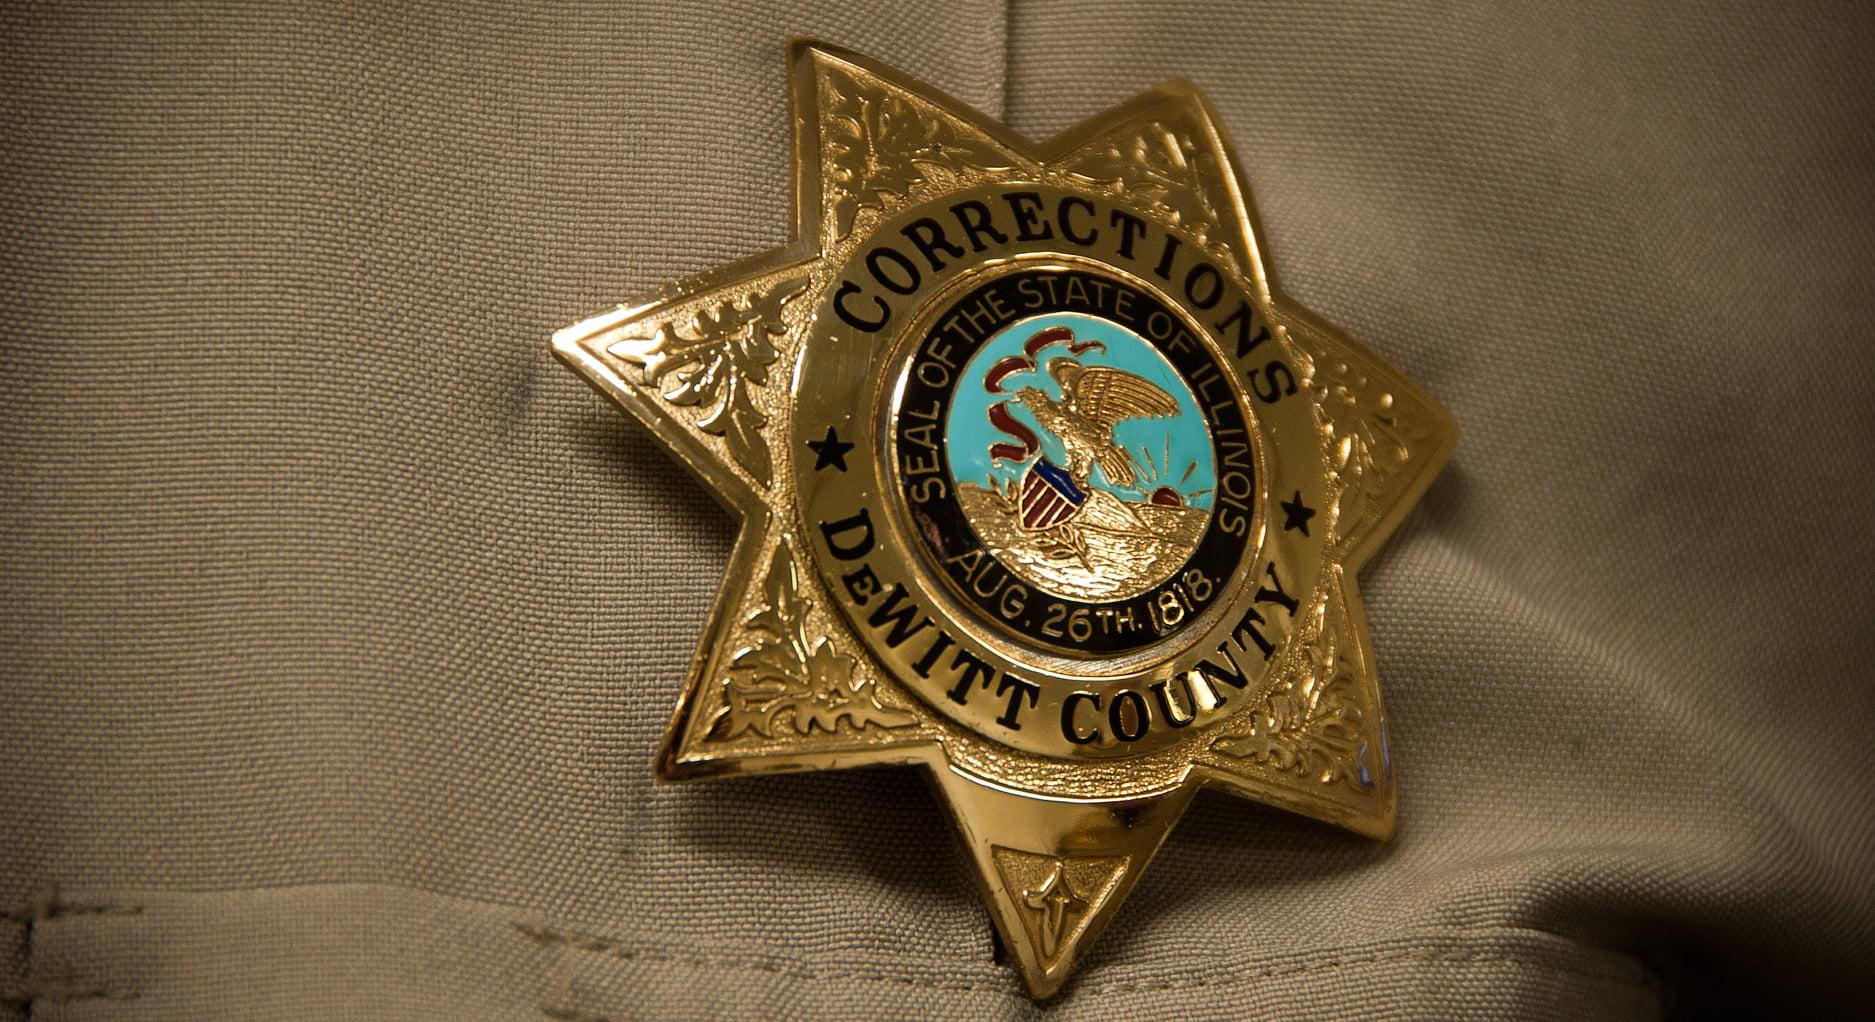 Wisconsin man involved in U.S. 51 standoff in Macon County post bond